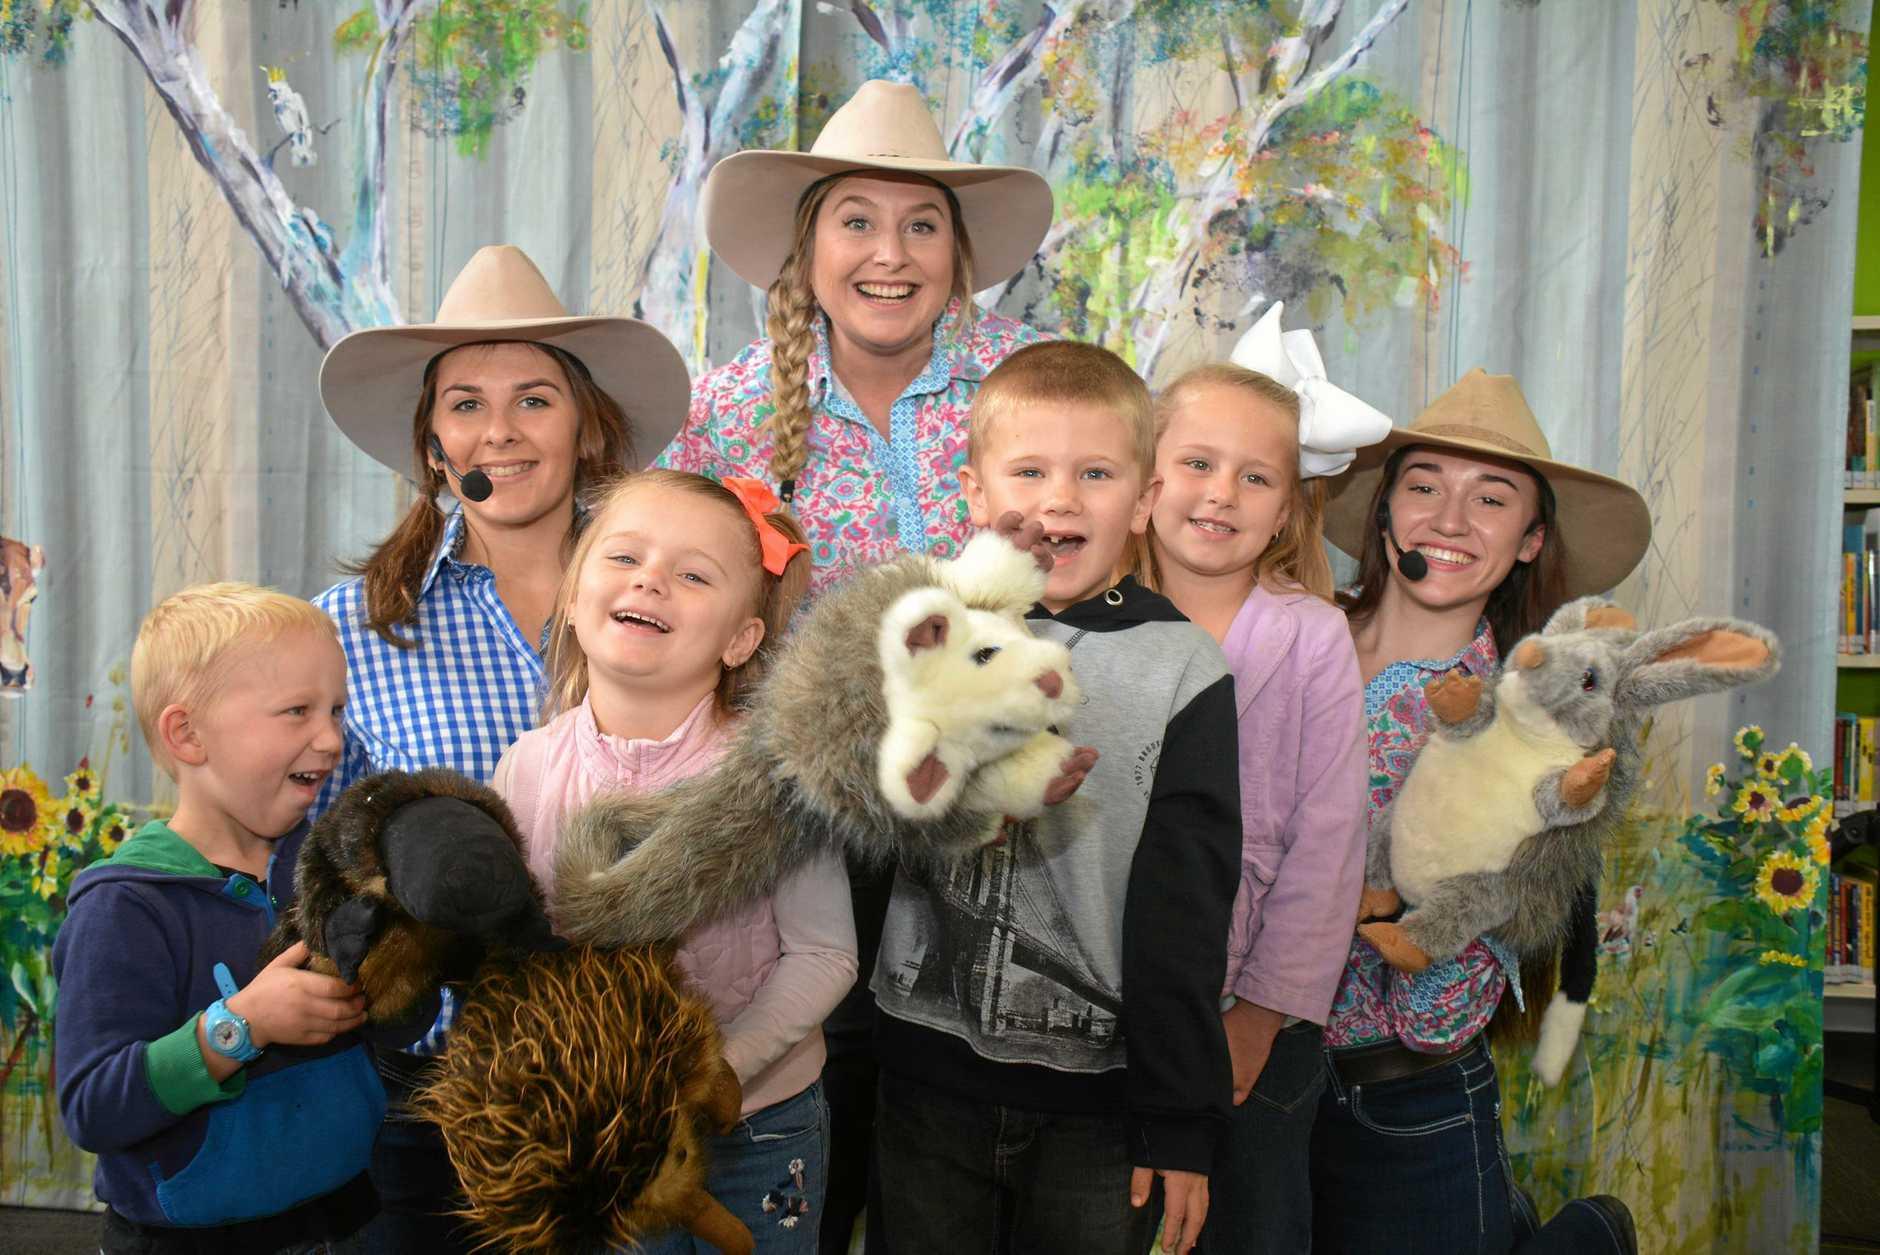 Koala Rumba presenters Eden Smith, Cilla Pershouse and Georgia Spark with Kingaroy kids David Jones, Ciara Adams, Kahn Fleischfresser and Allyrah Adams after the Kingaroy library concert on July 4 last year.